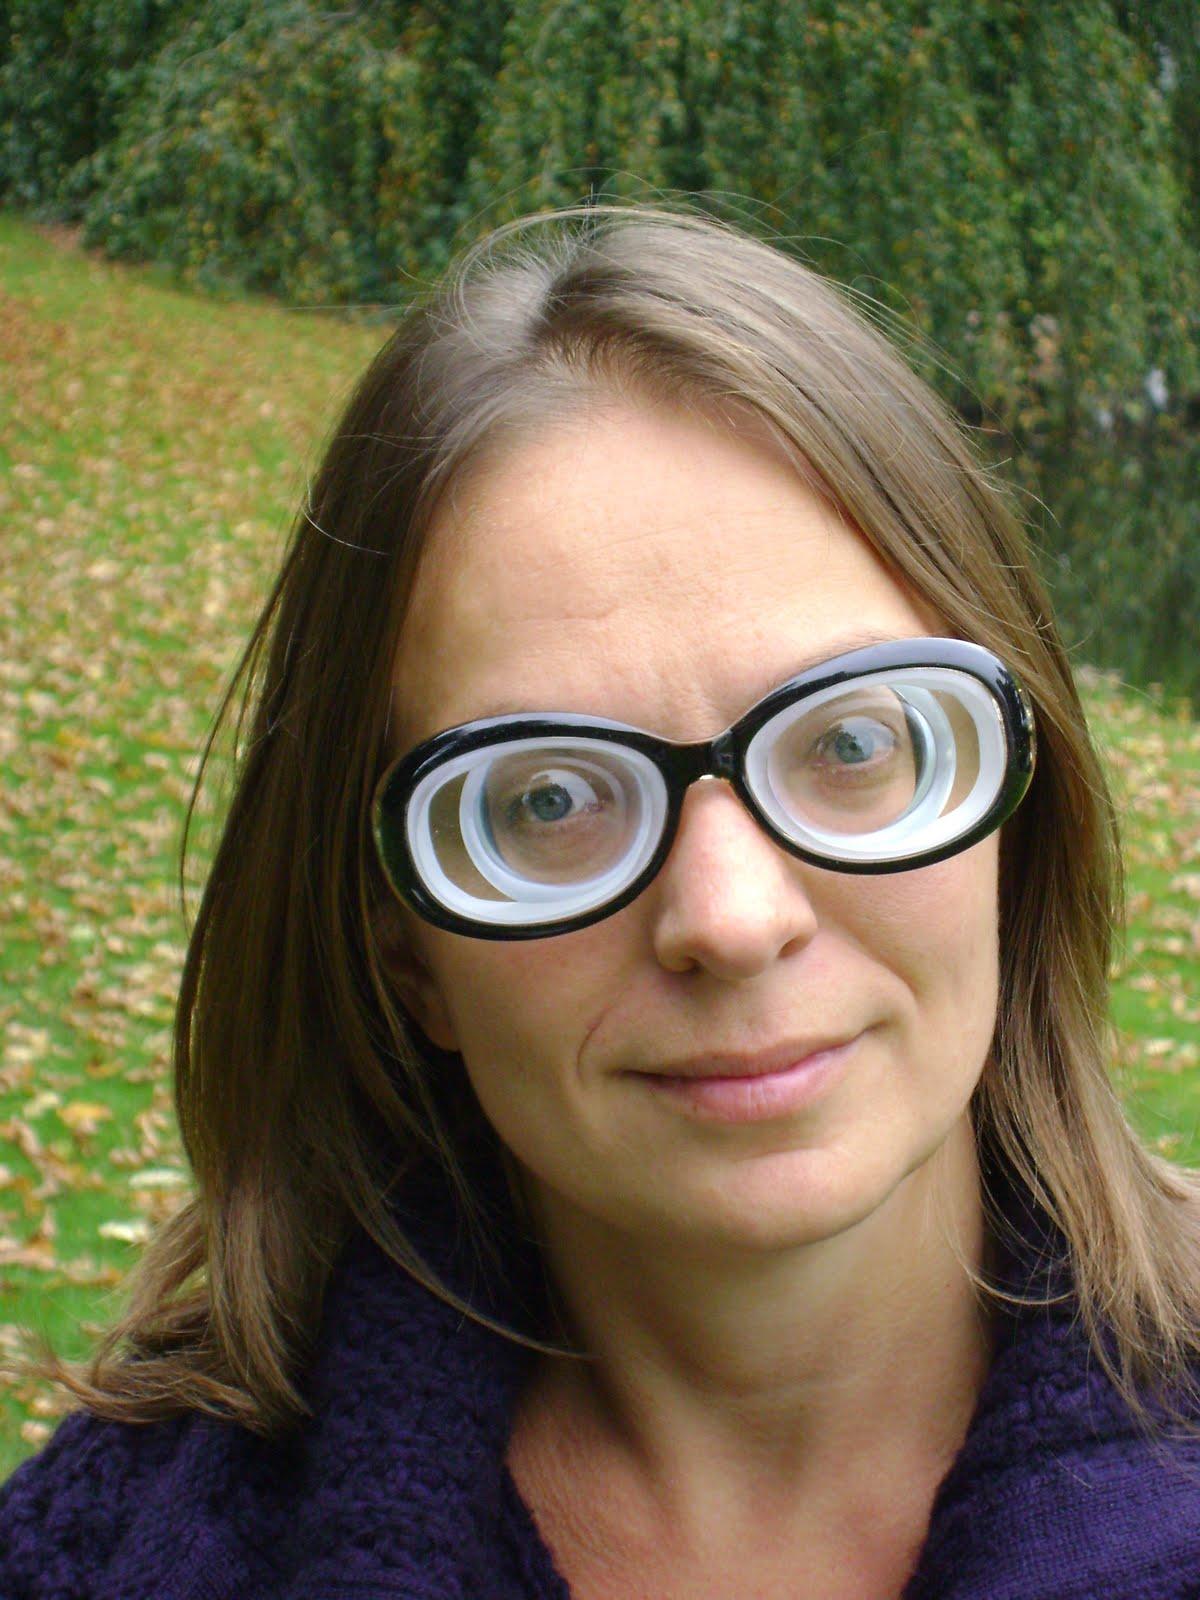 Women Wearing Eyeglasses Full Time